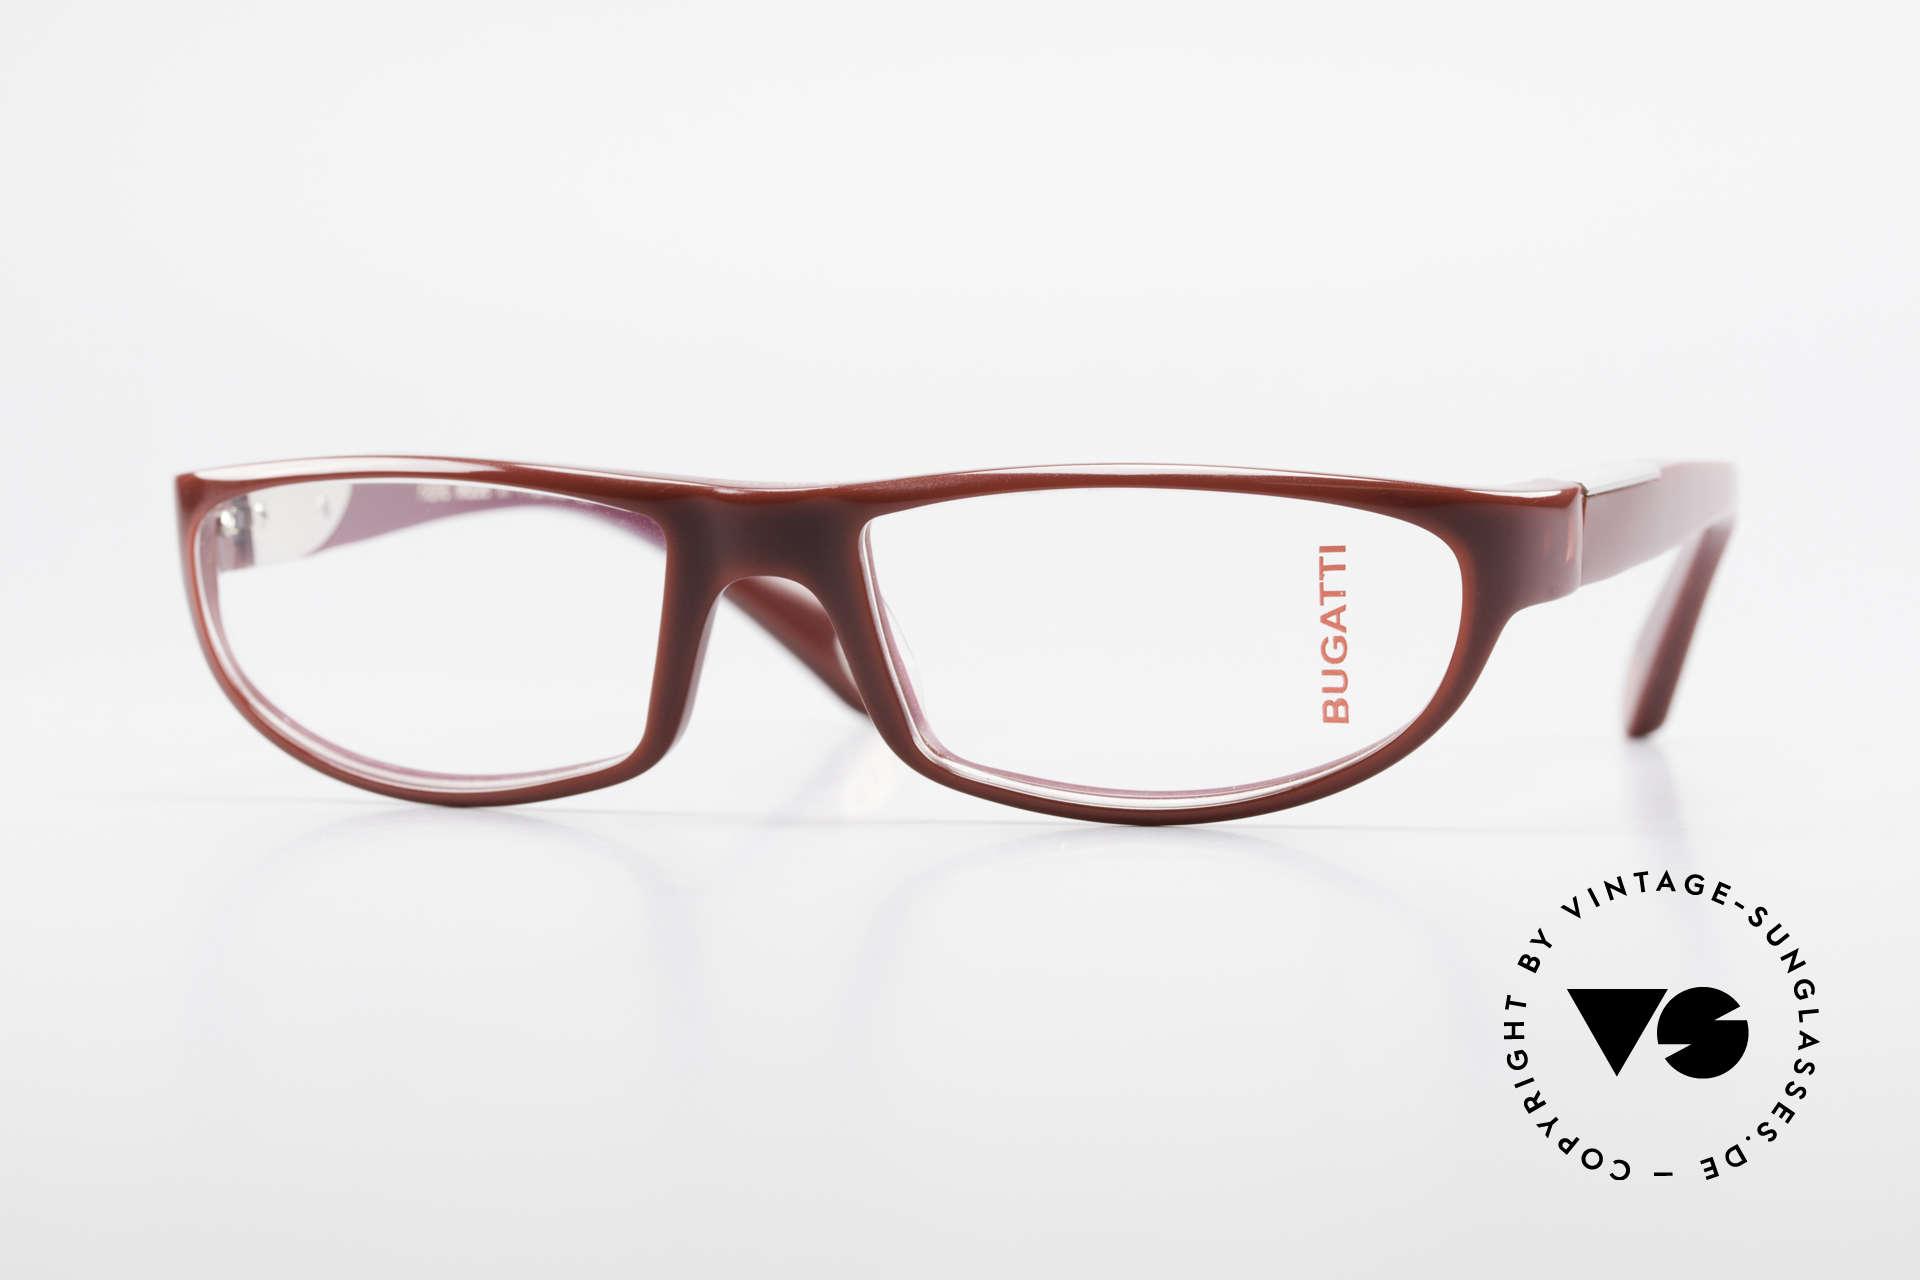 Bugatti 534 Striking Plastic Eyeglass-Frame, striking plastic eyeglass-frame by BUGATTI, Made for Men